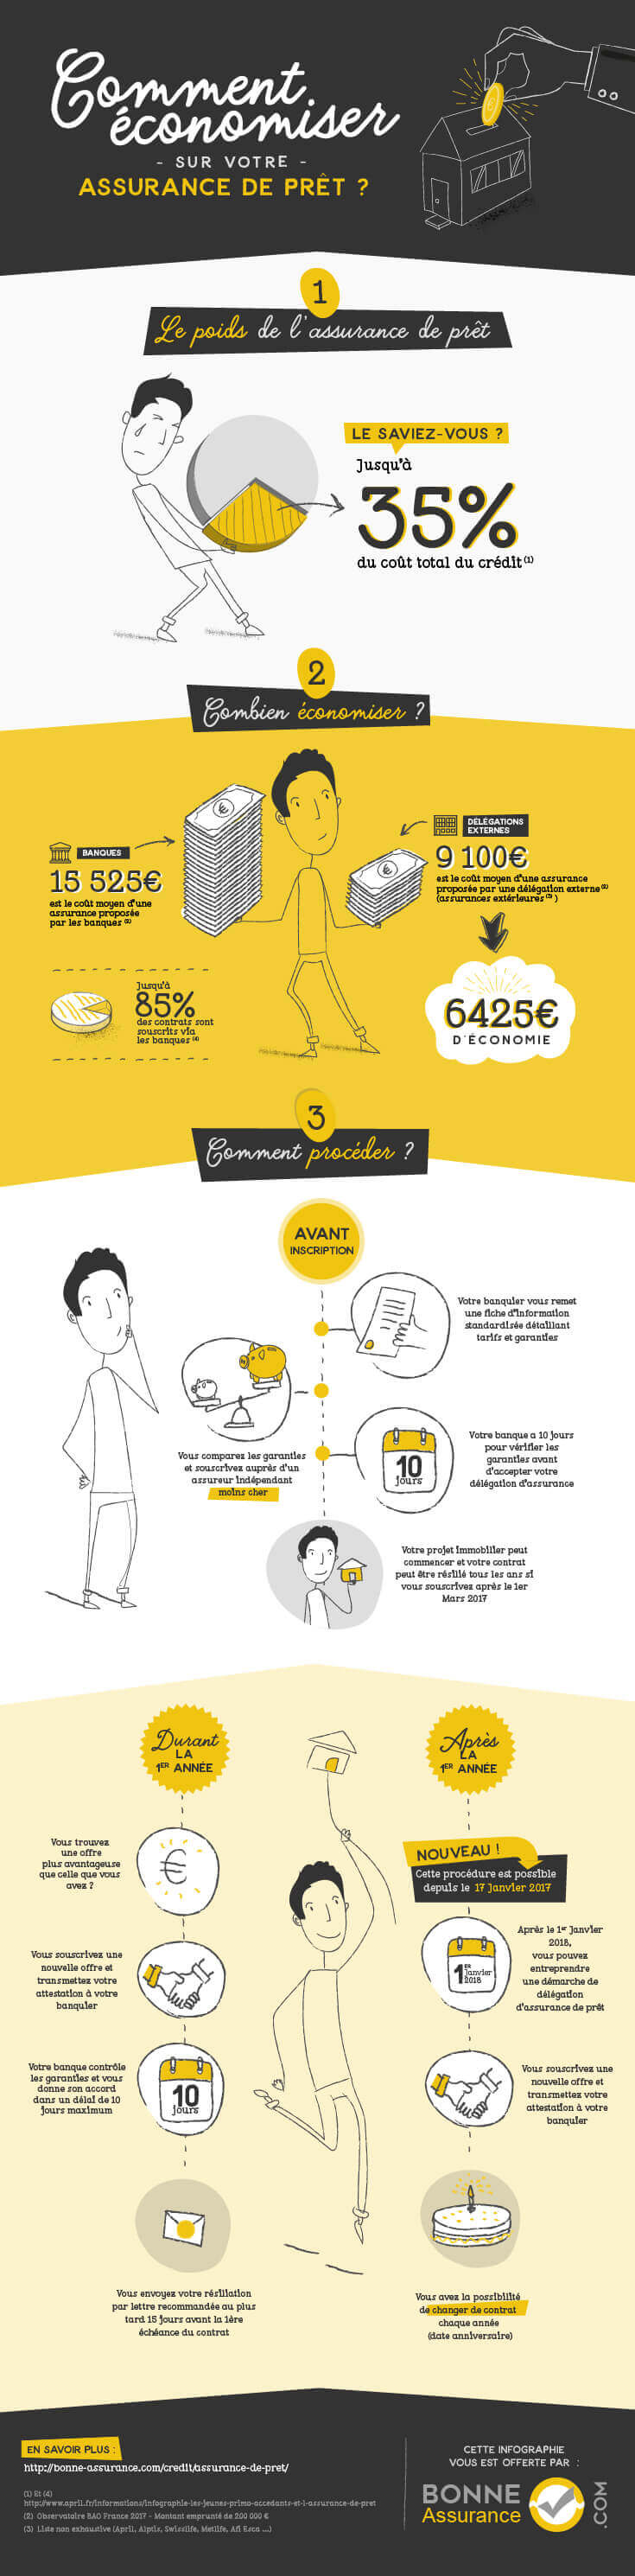 Assurance prêt infographie